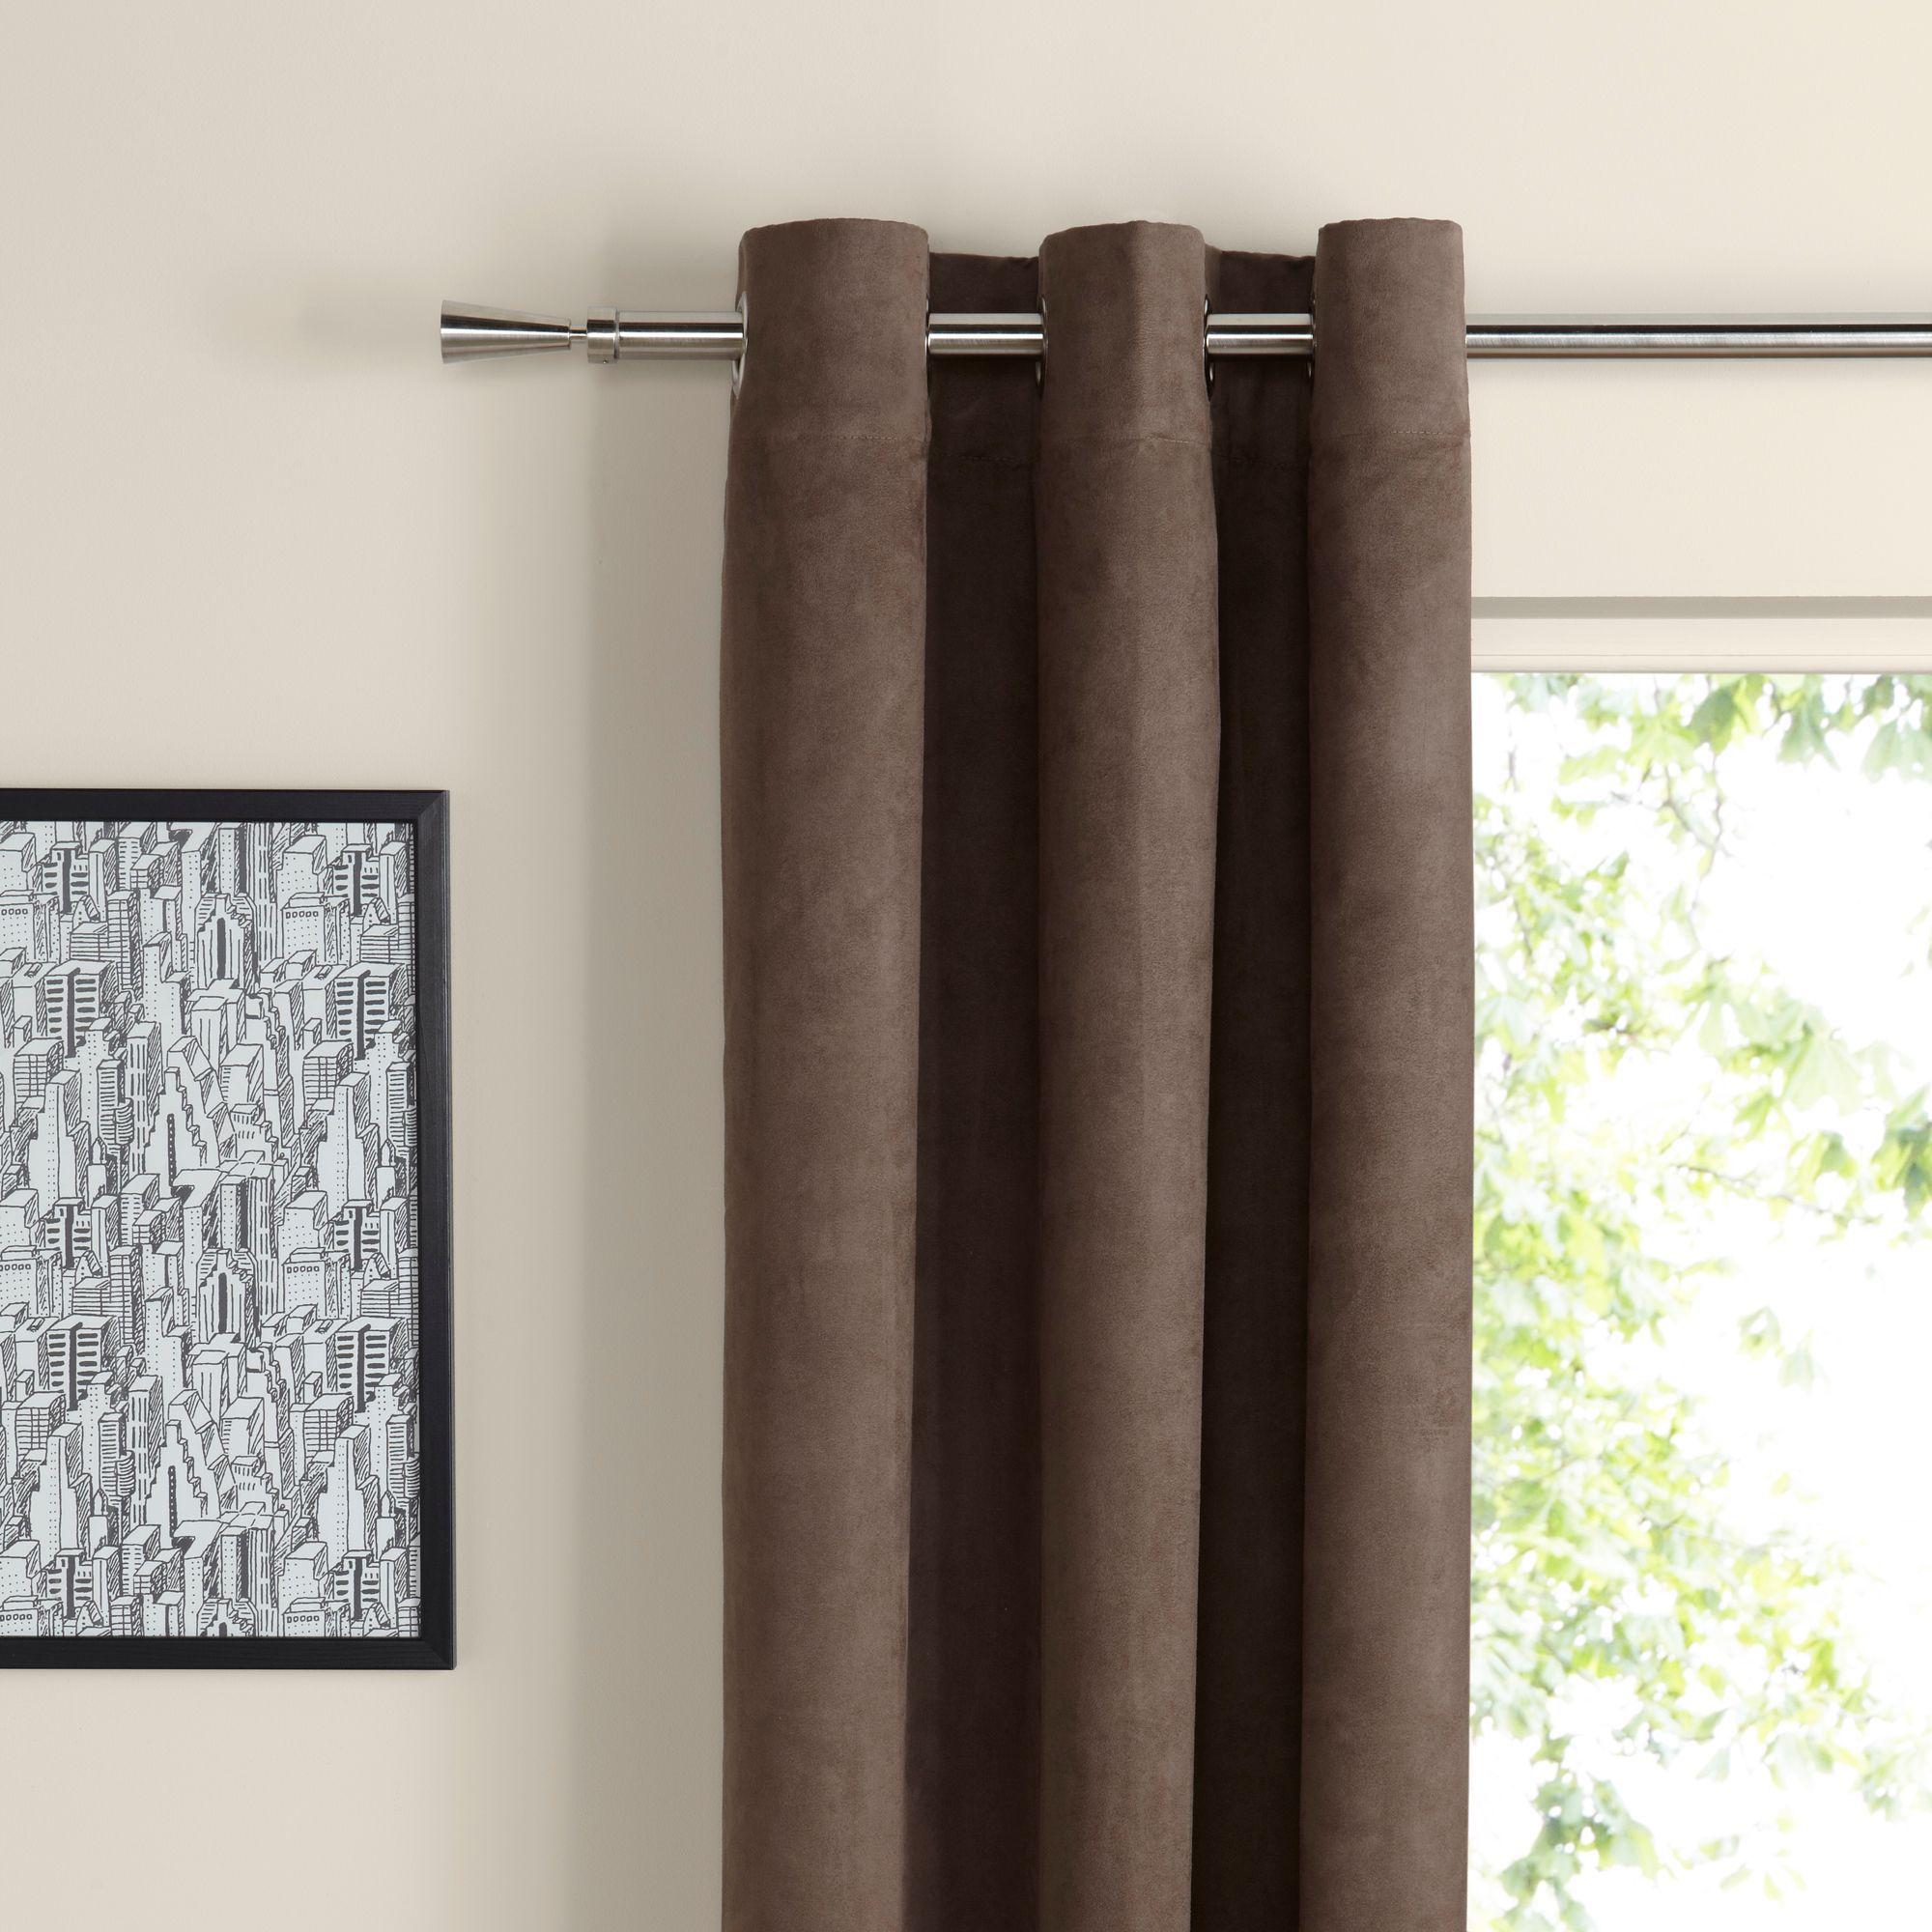 Suedine Chocolate Plain Woven Eyelet Curtains (W)117 cm